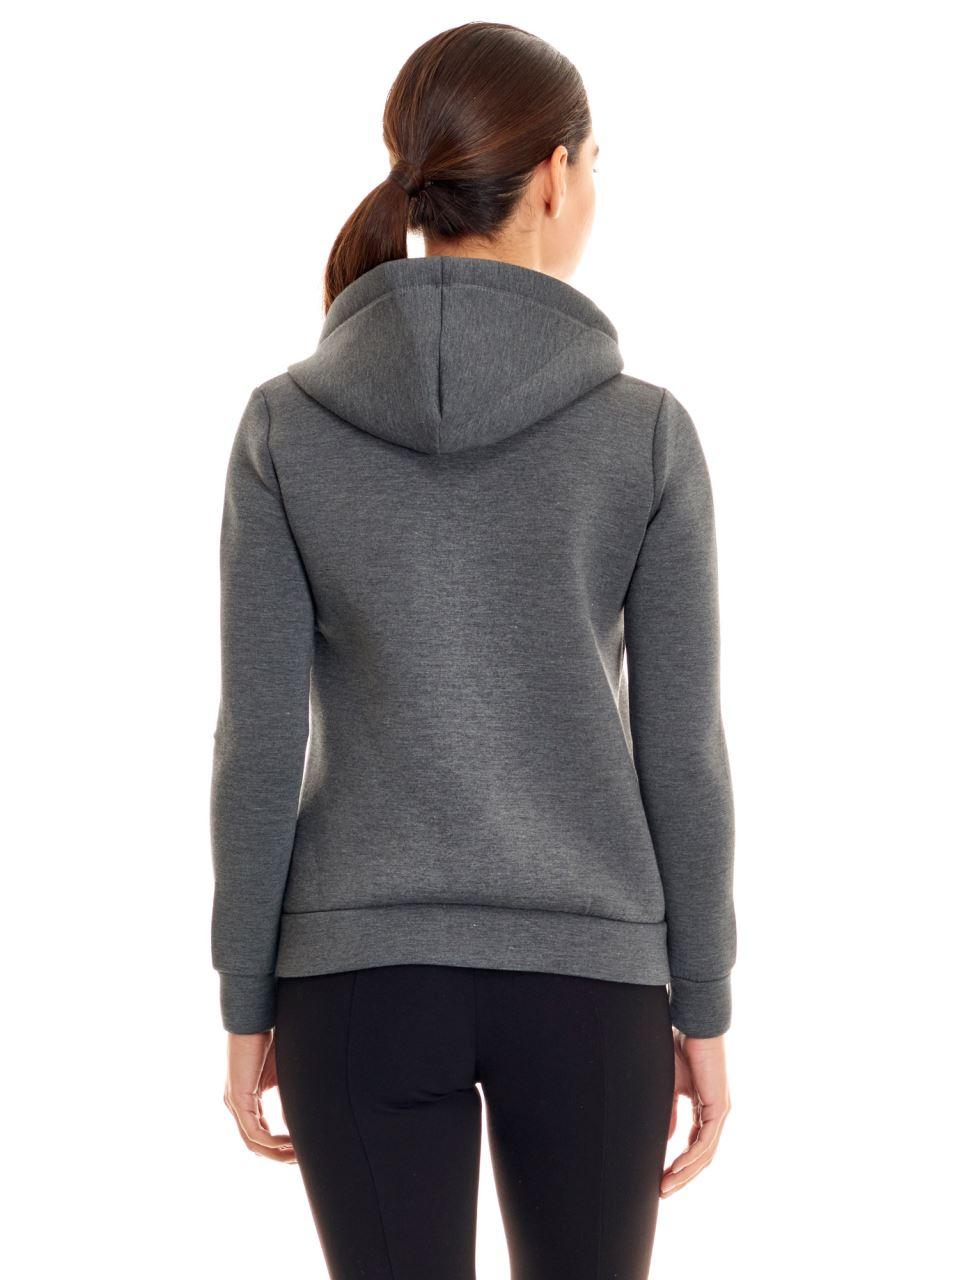 K95175 Sweatshirt